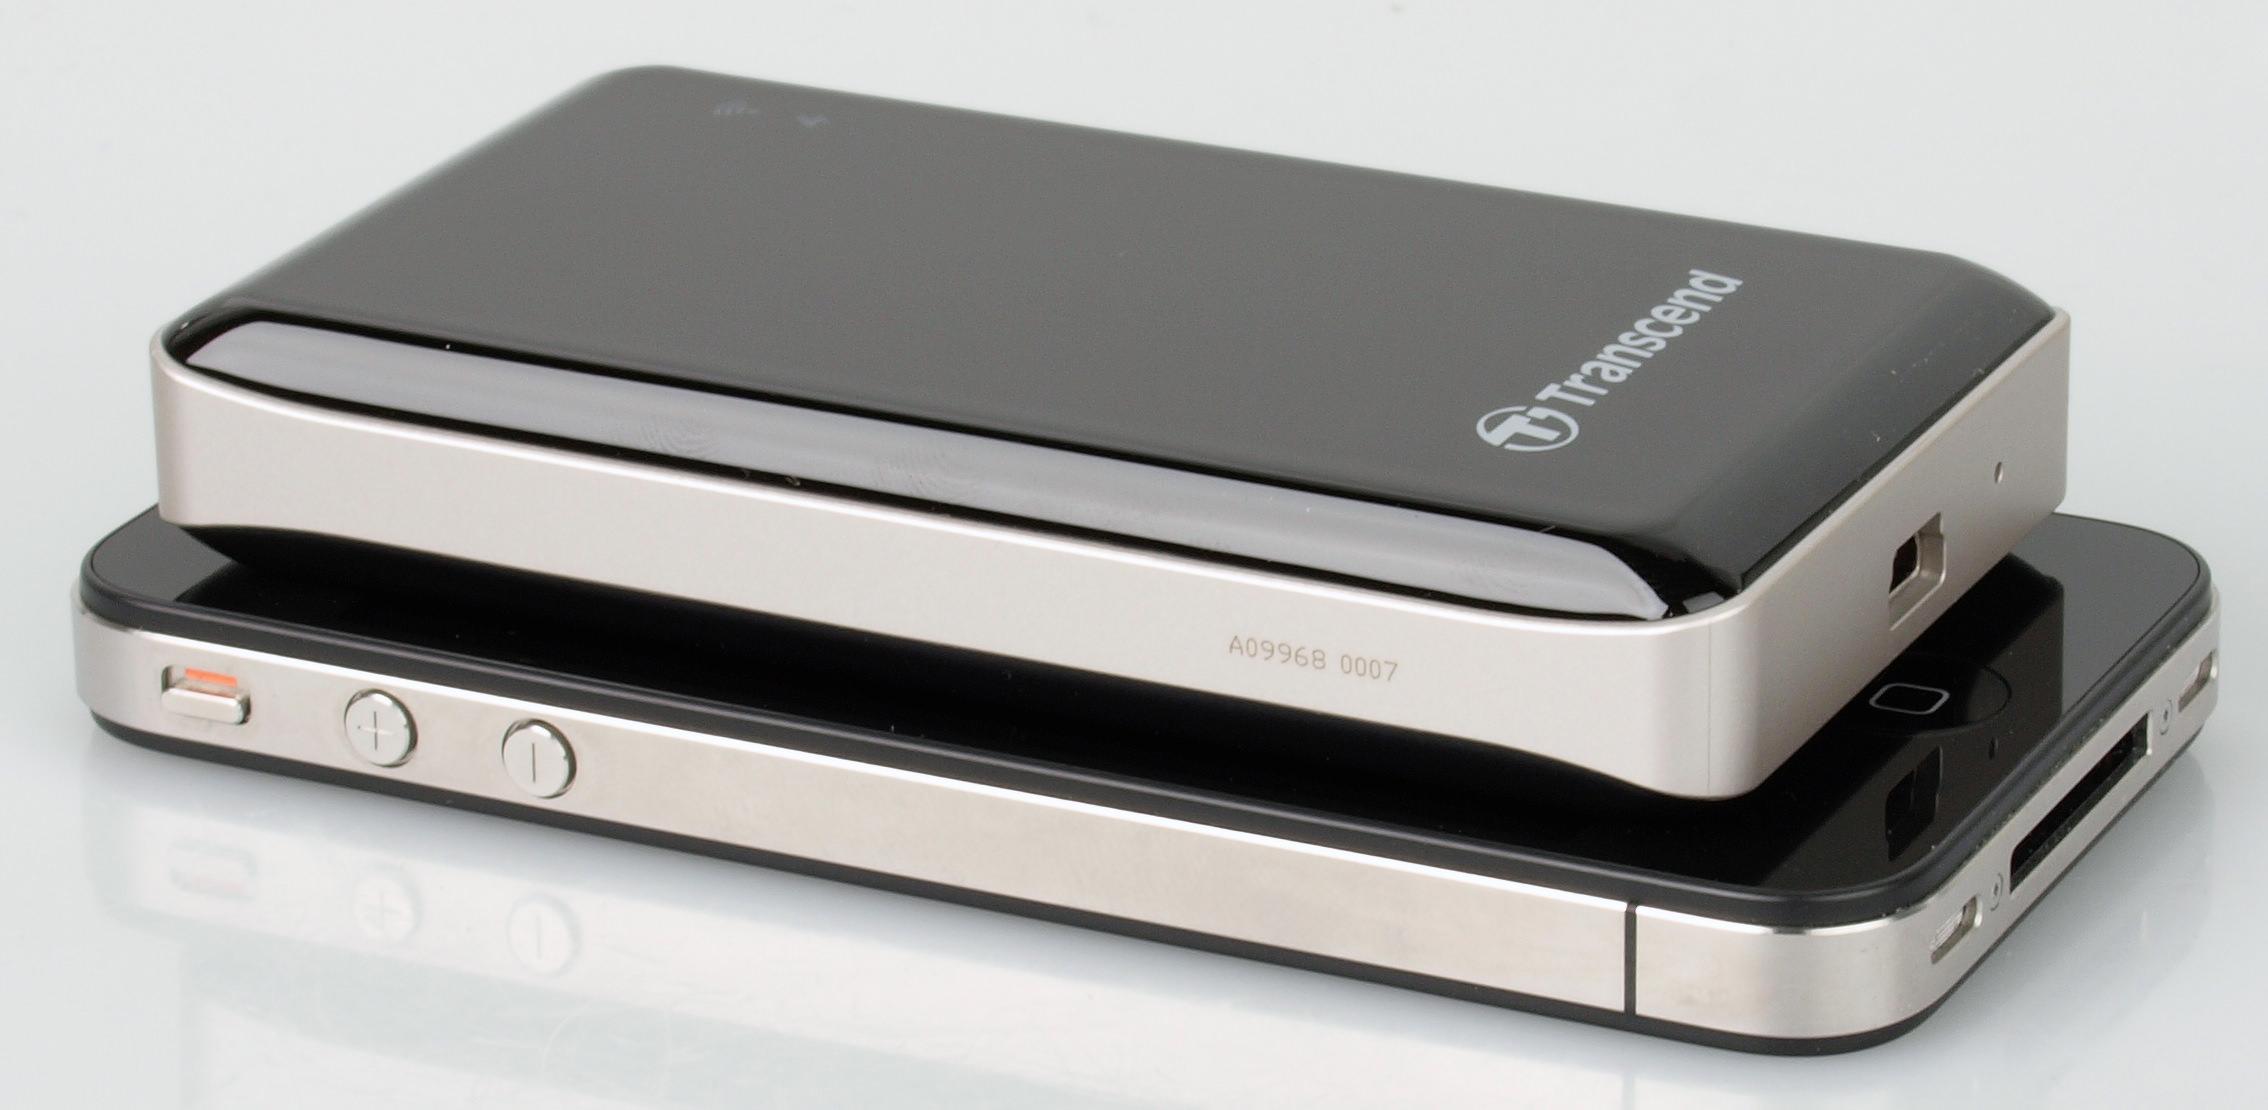 Transcend Portable Wireless Drive Storejet Cloud 32gb Review